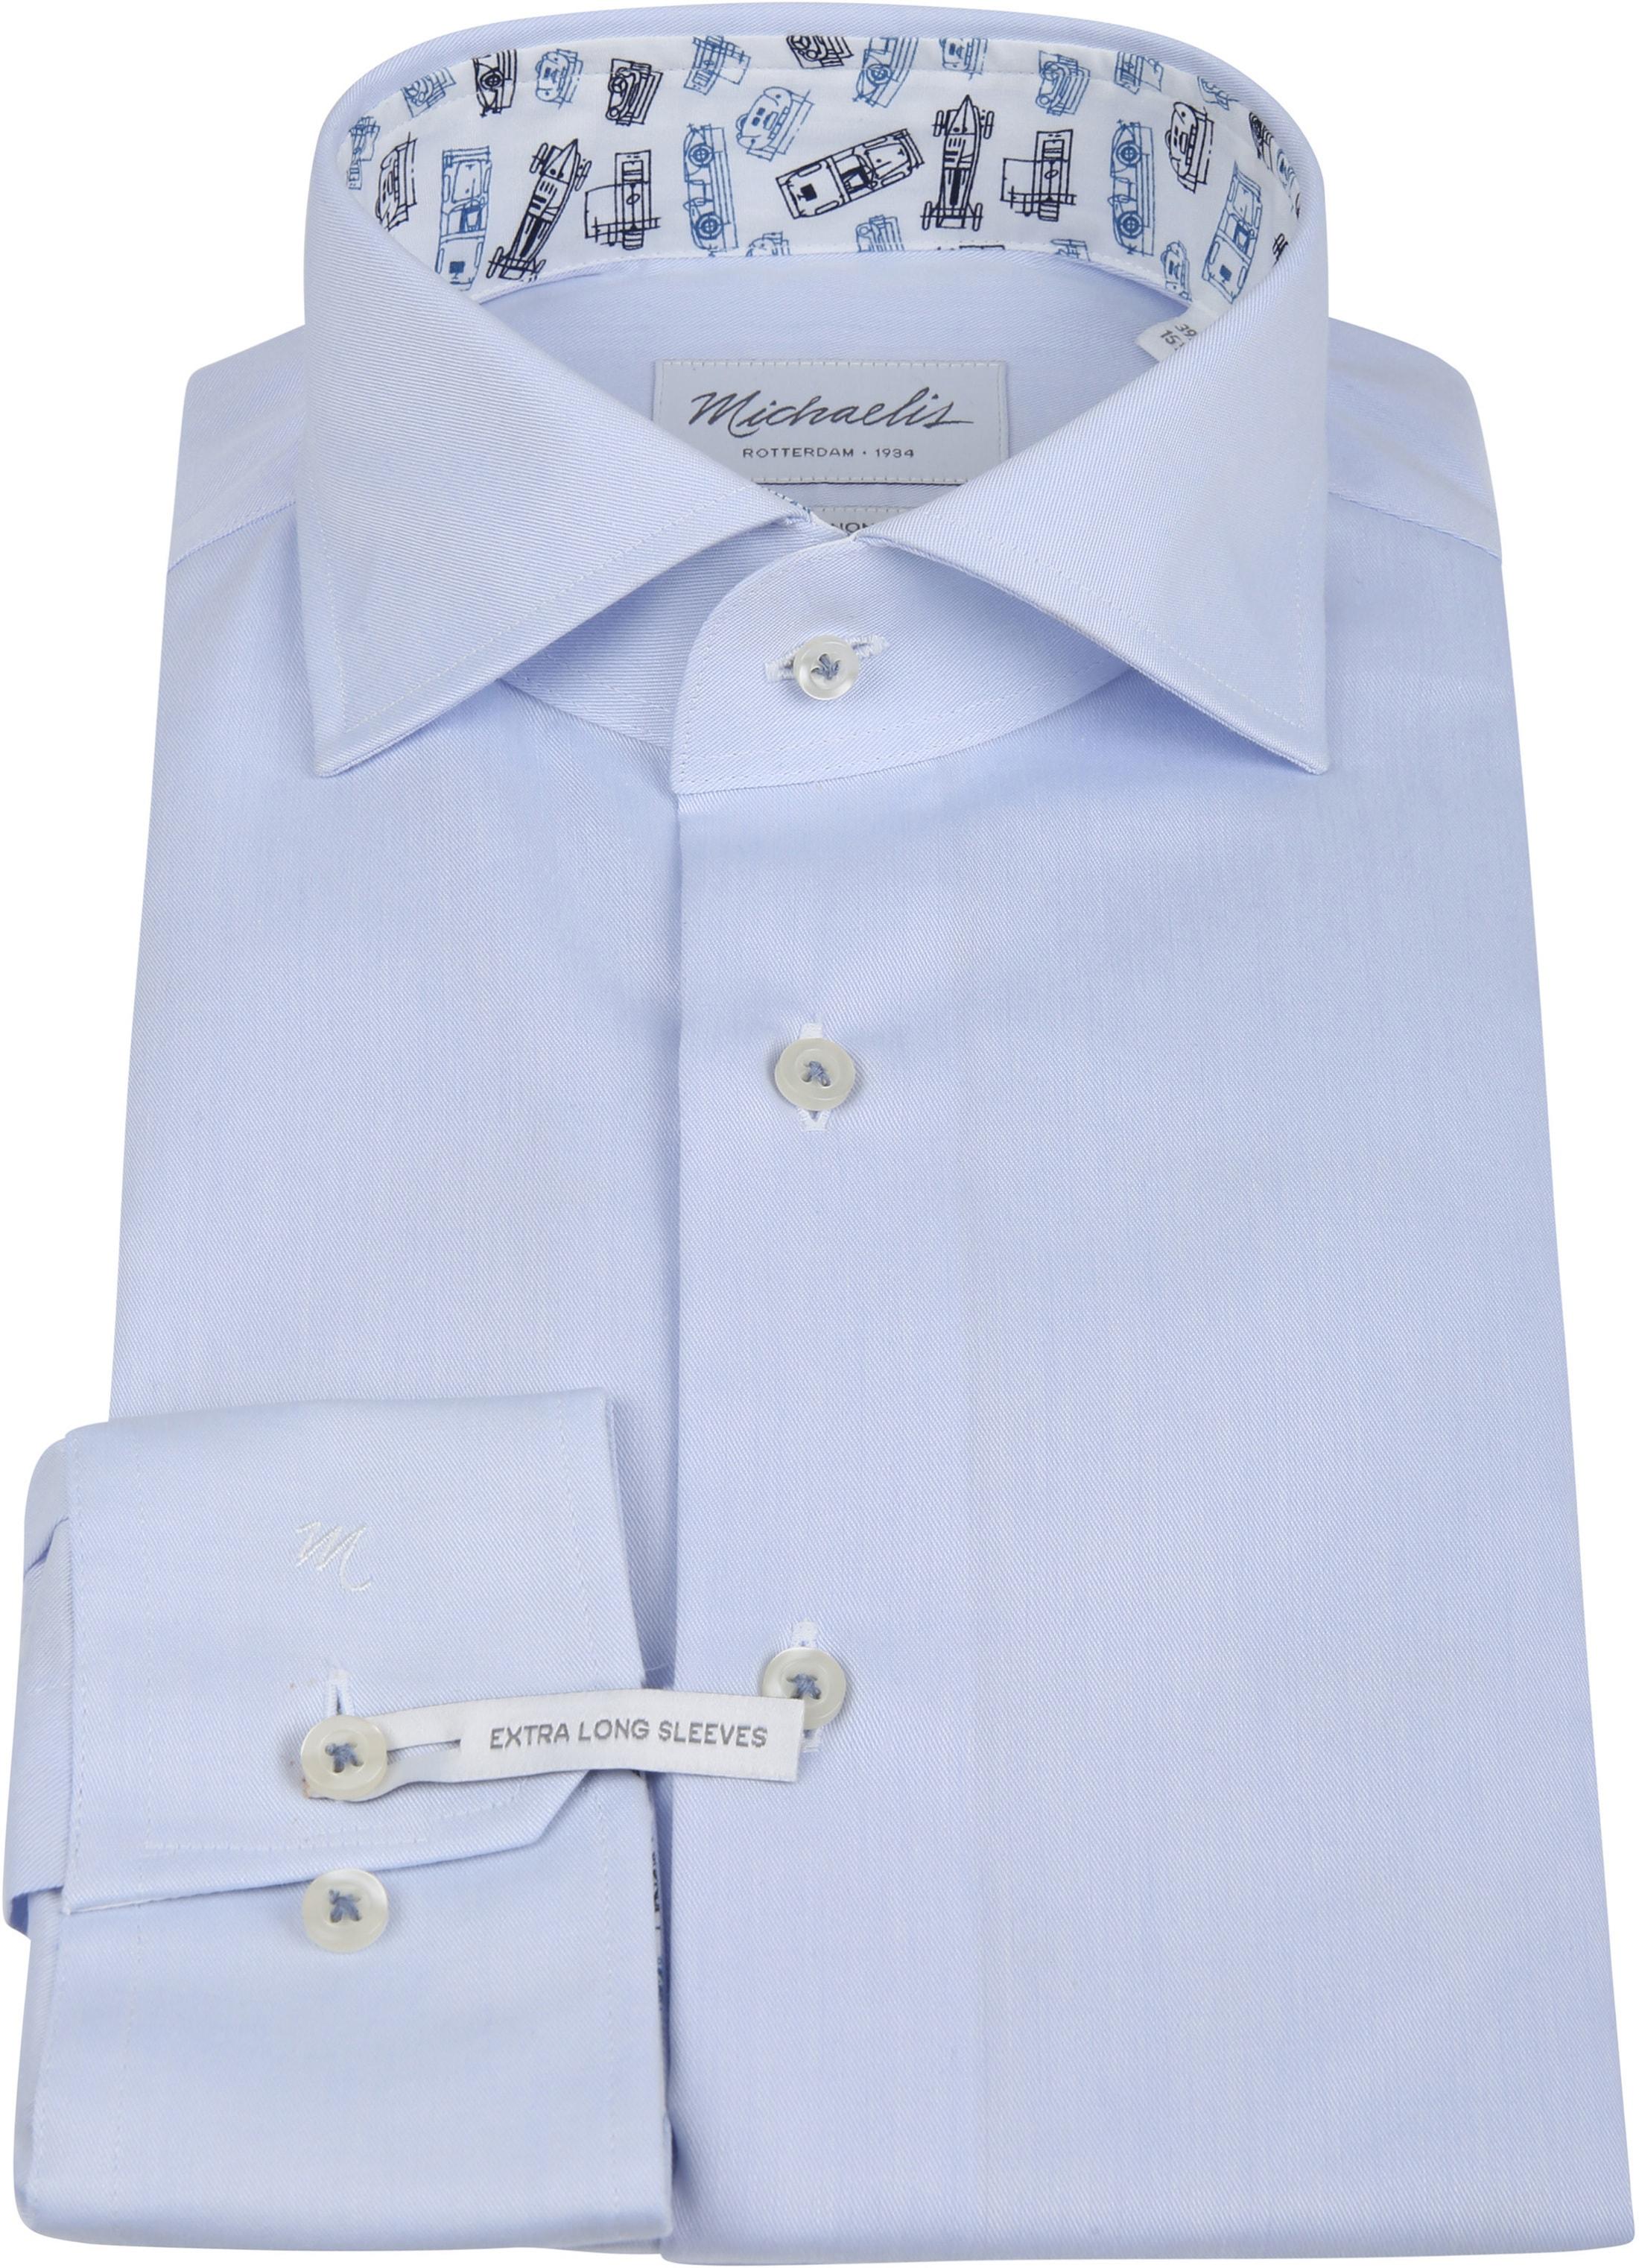 Michaelis Shirt SL7 Blue  foto 2